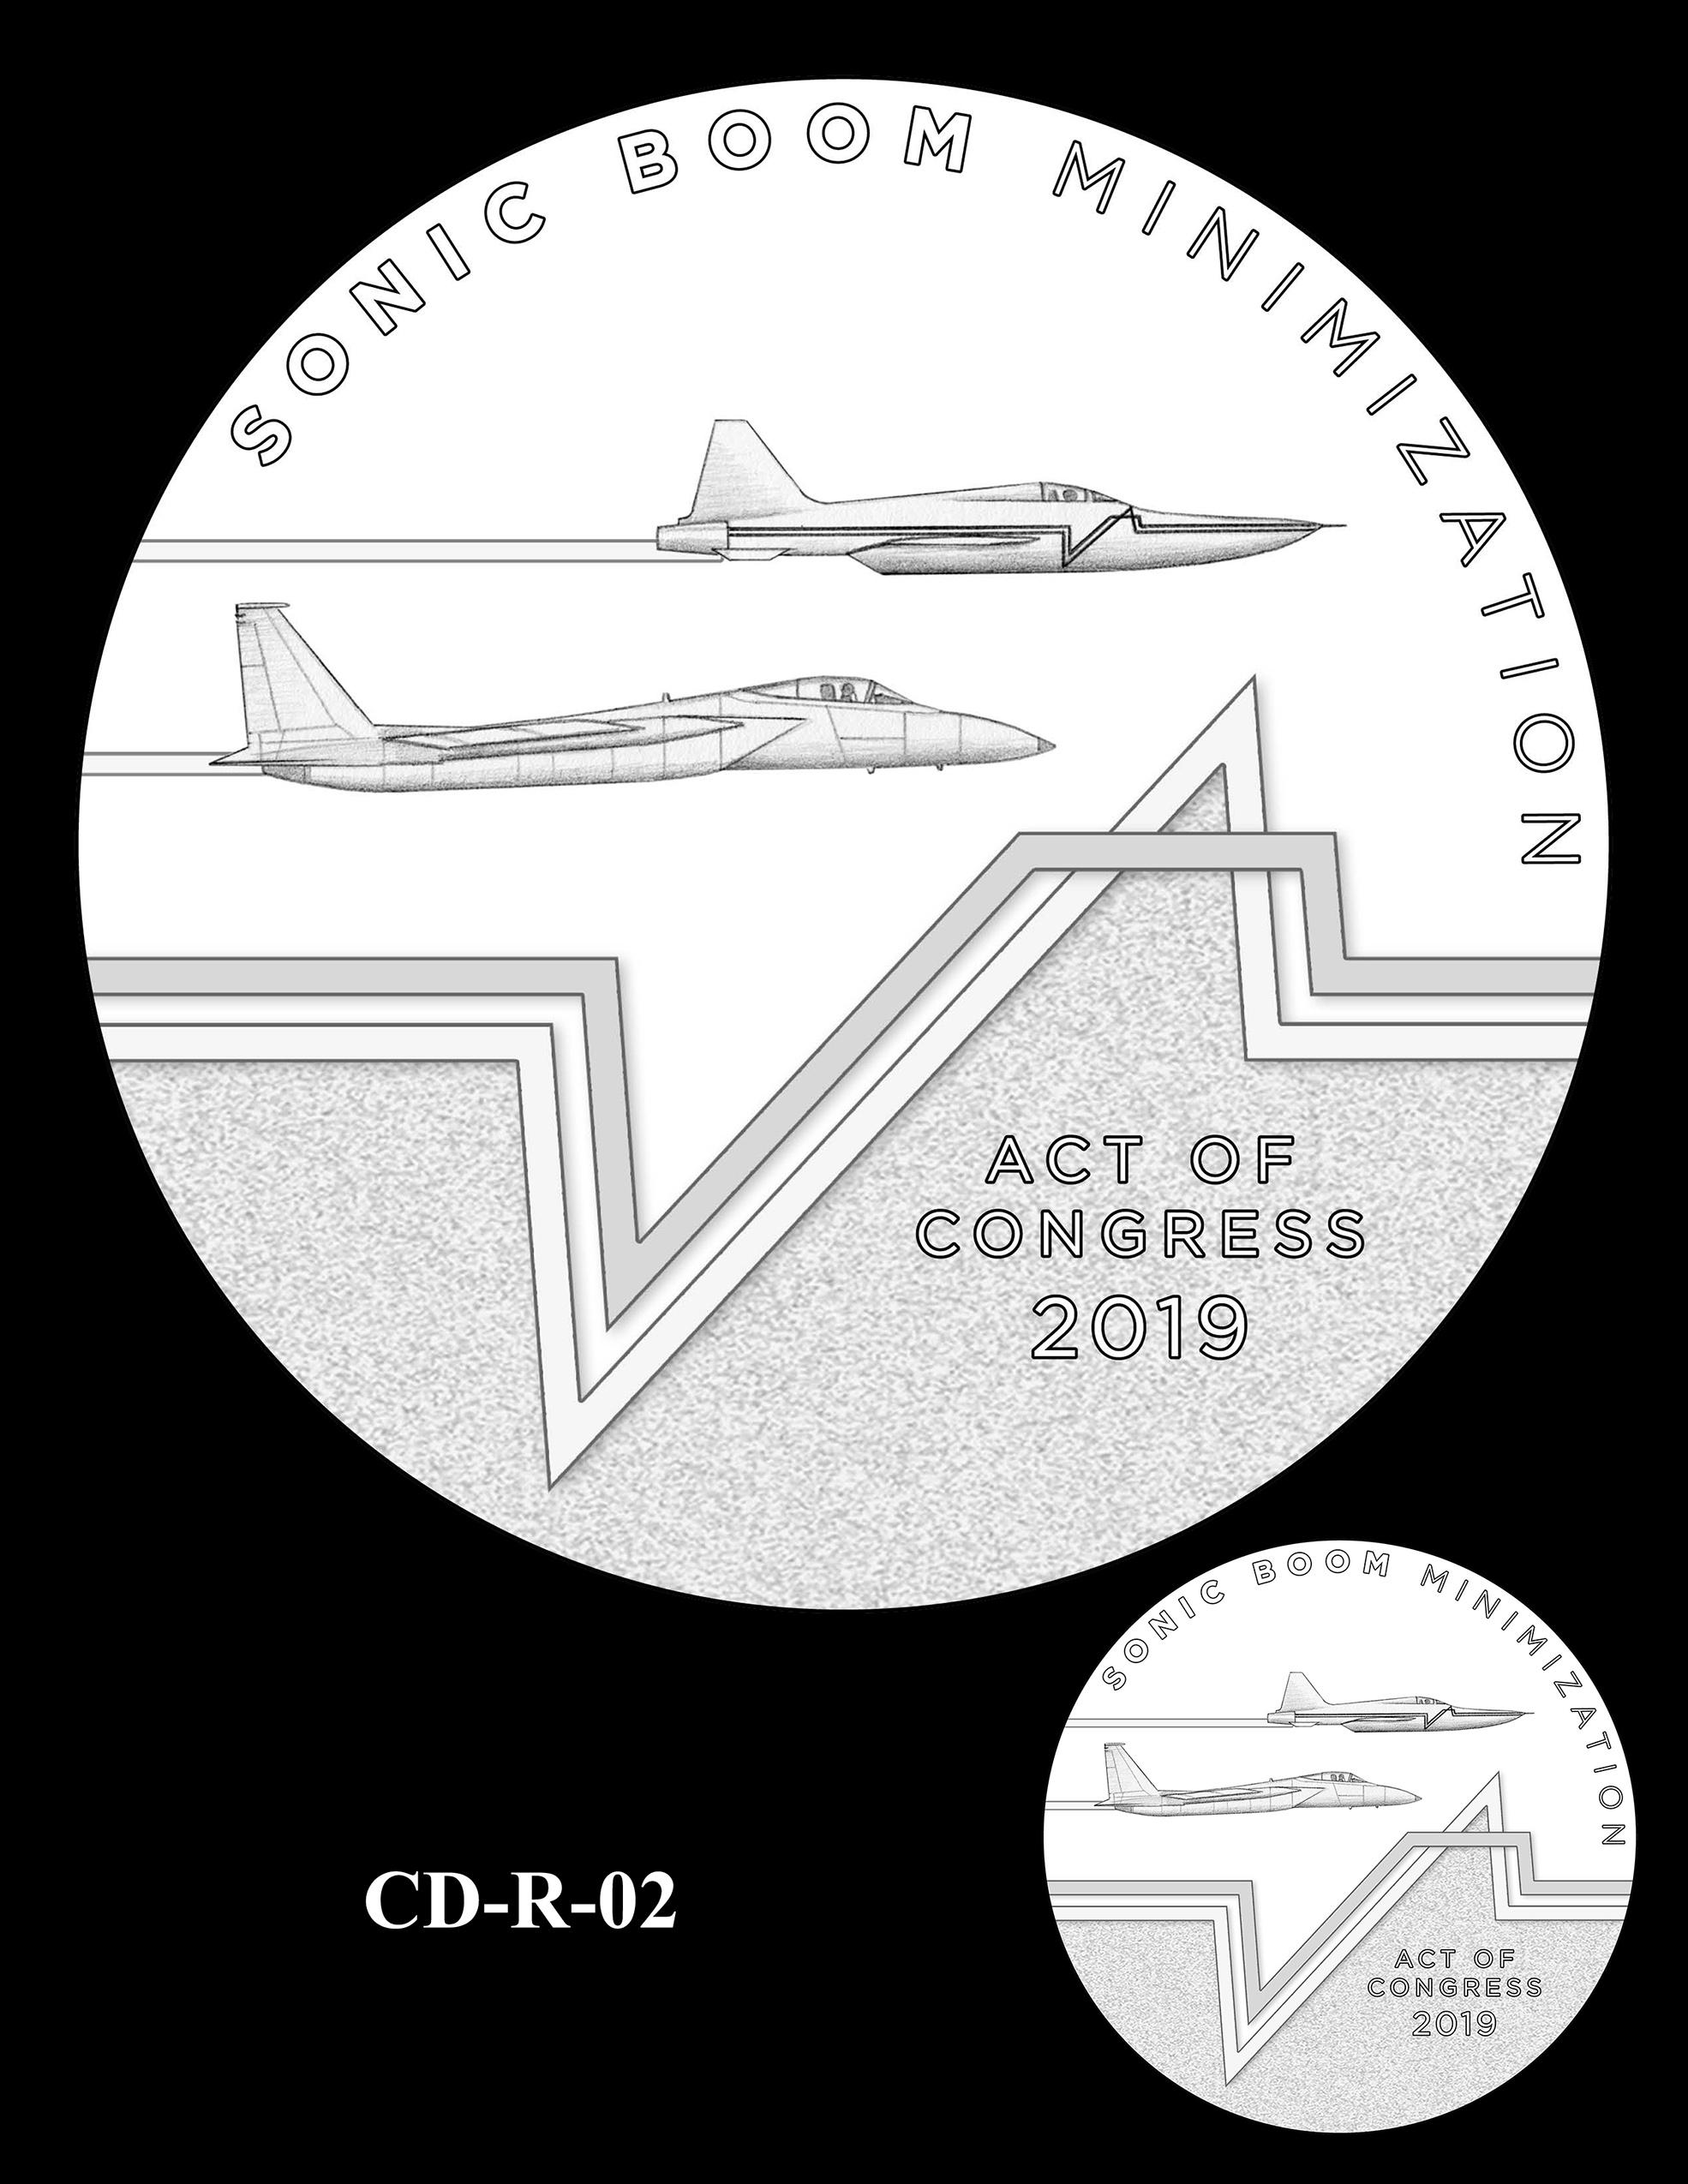 CD-R-02 -- Dr. Christine Darden Congressional Gold Medal